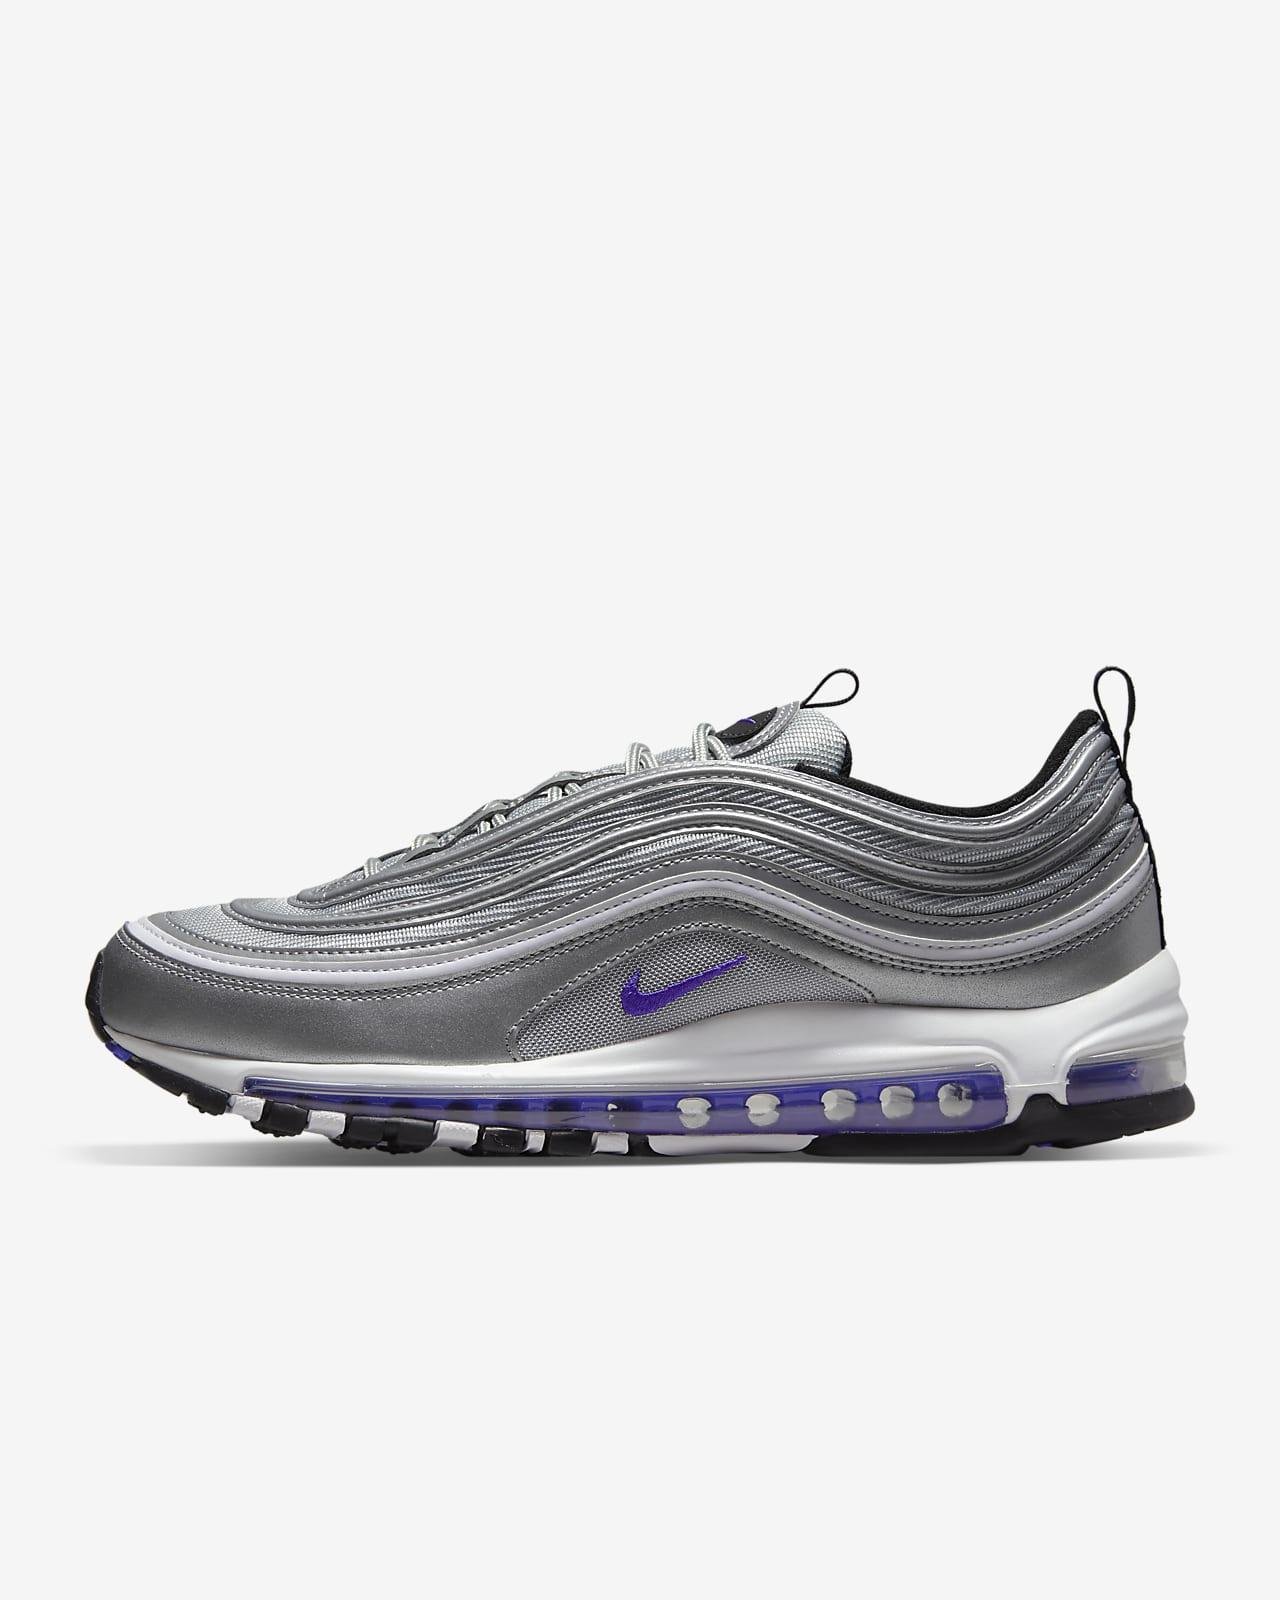 Chaussure Nike Air Max97 pour Homme